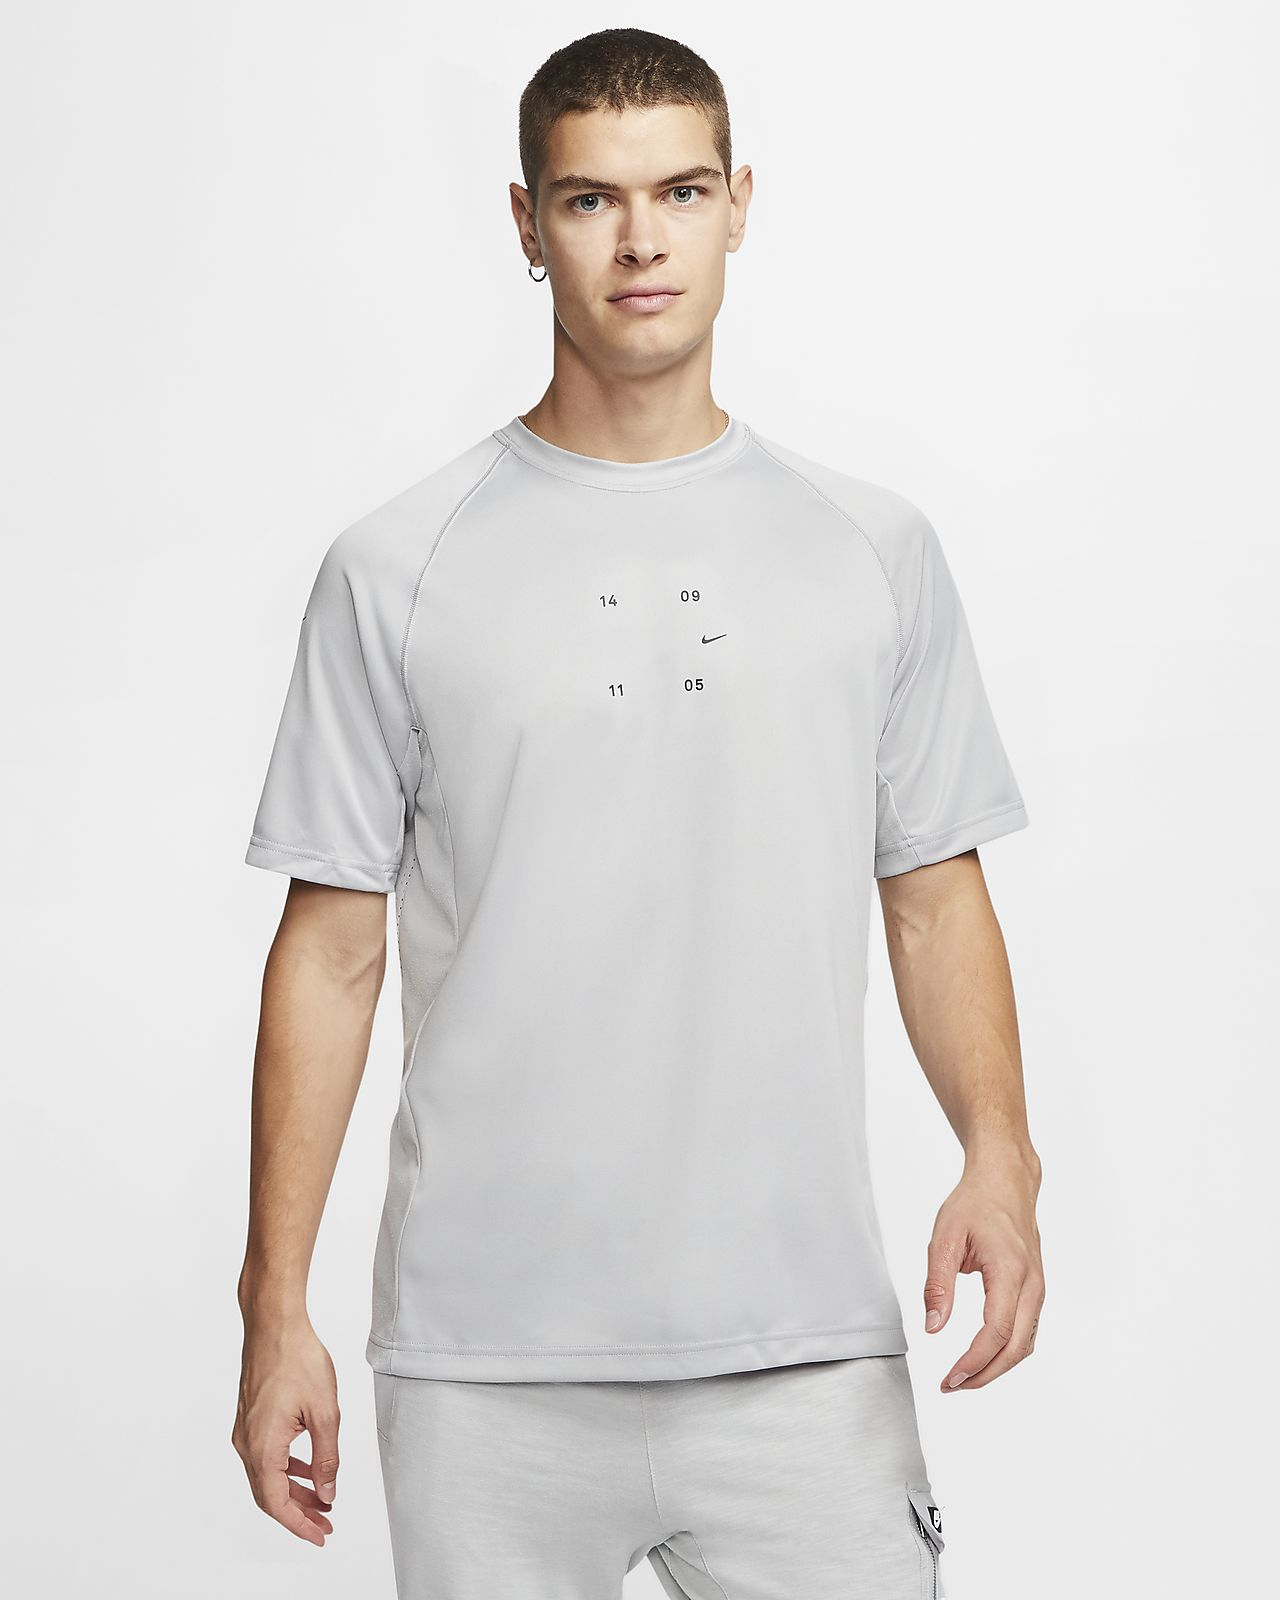 Kortärmad stickad tröja Nike Sportswear Tech Pack för män